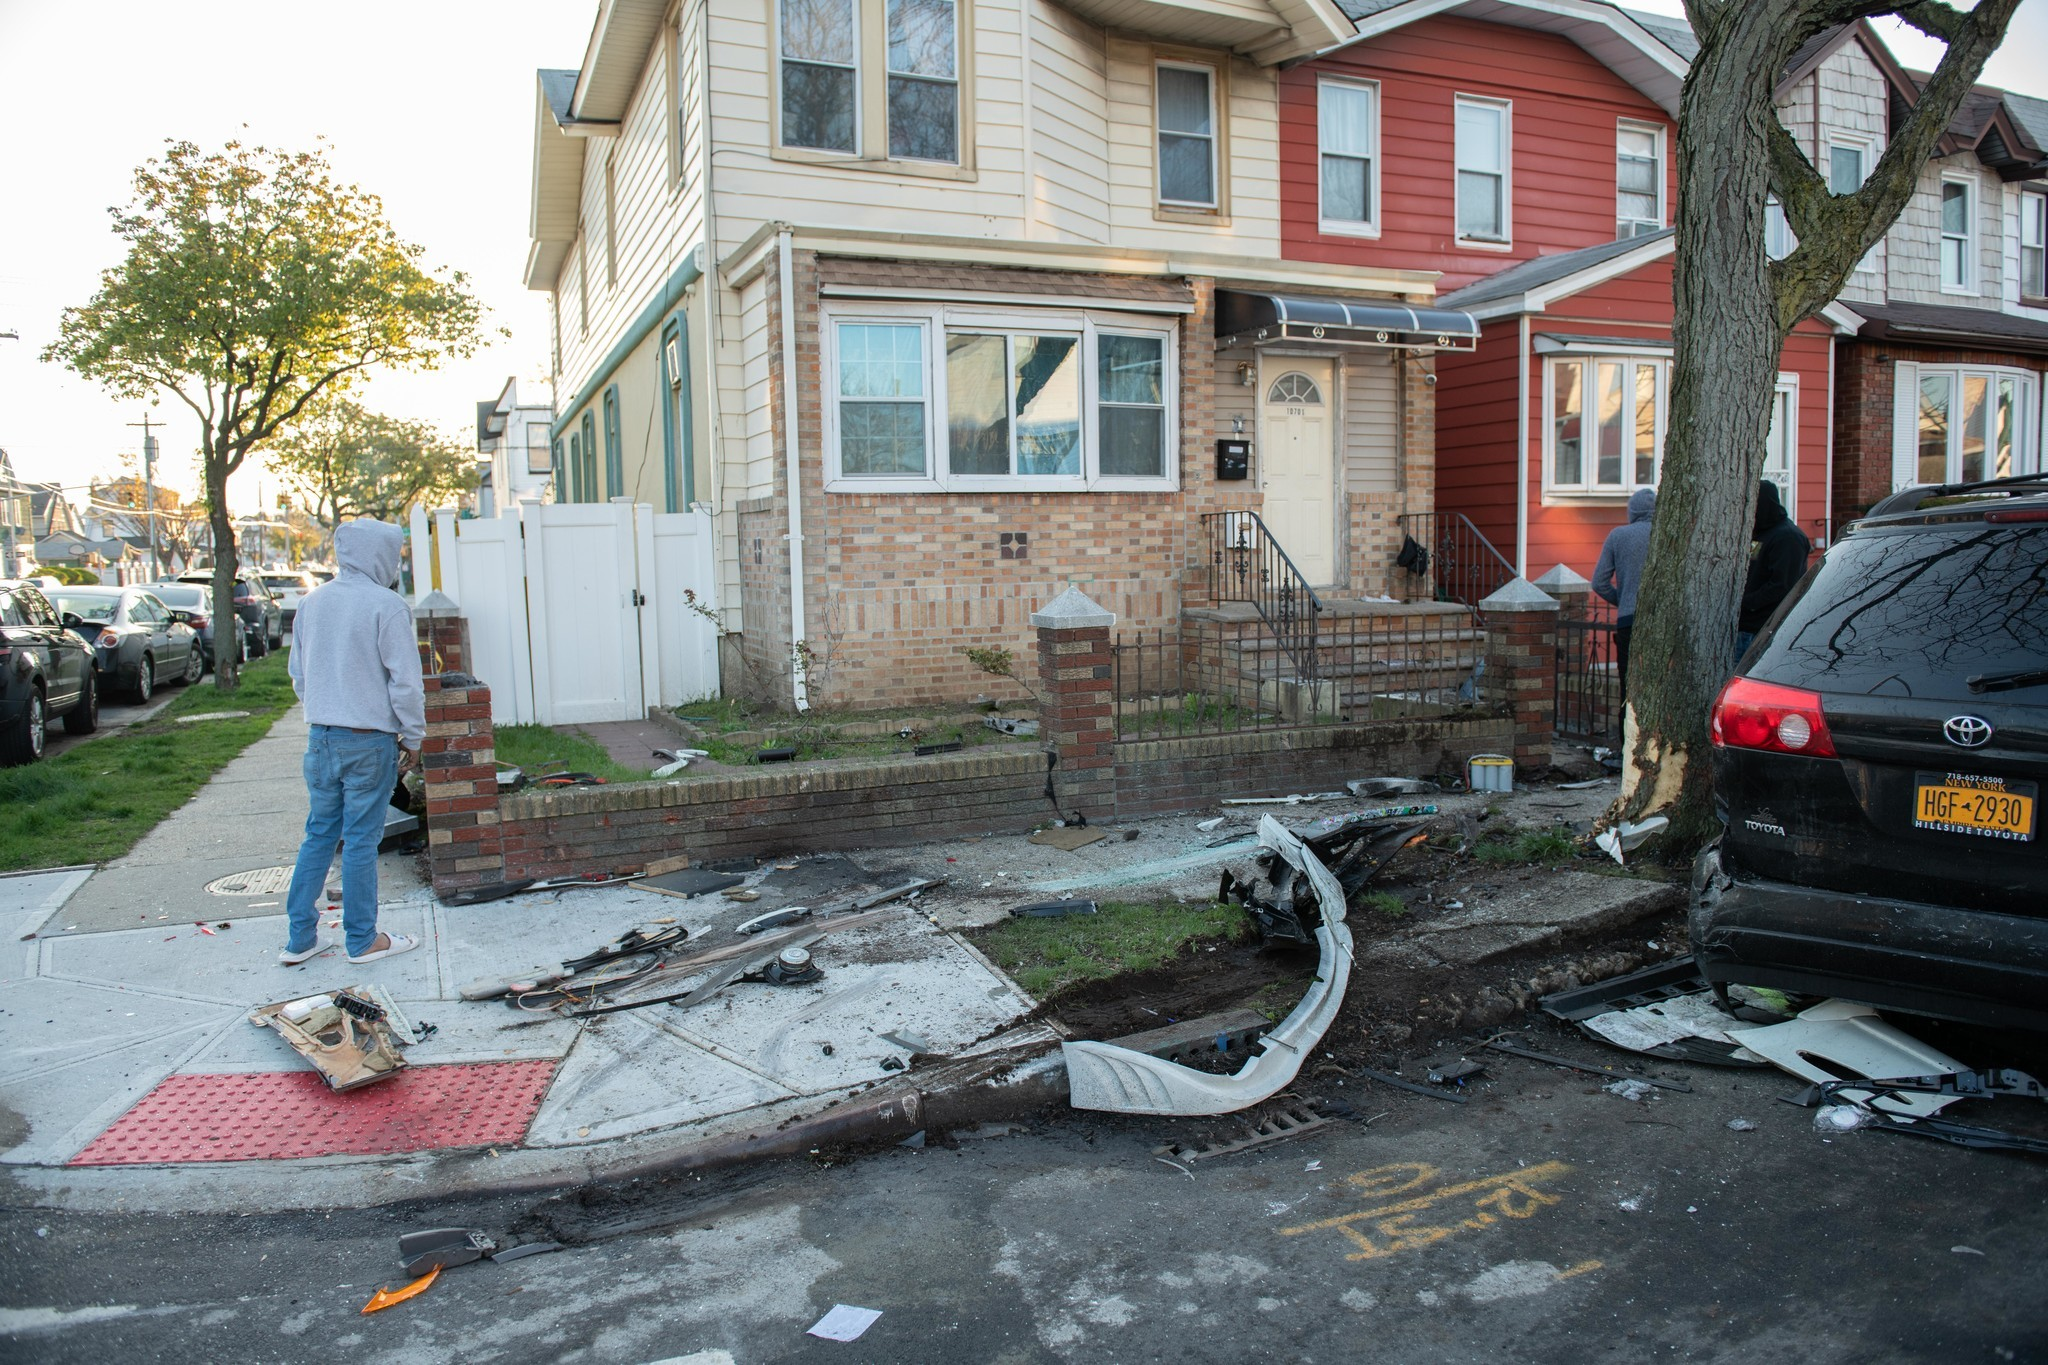 NYC man, 21, dies in crash sparked by unlicensed driver: cops